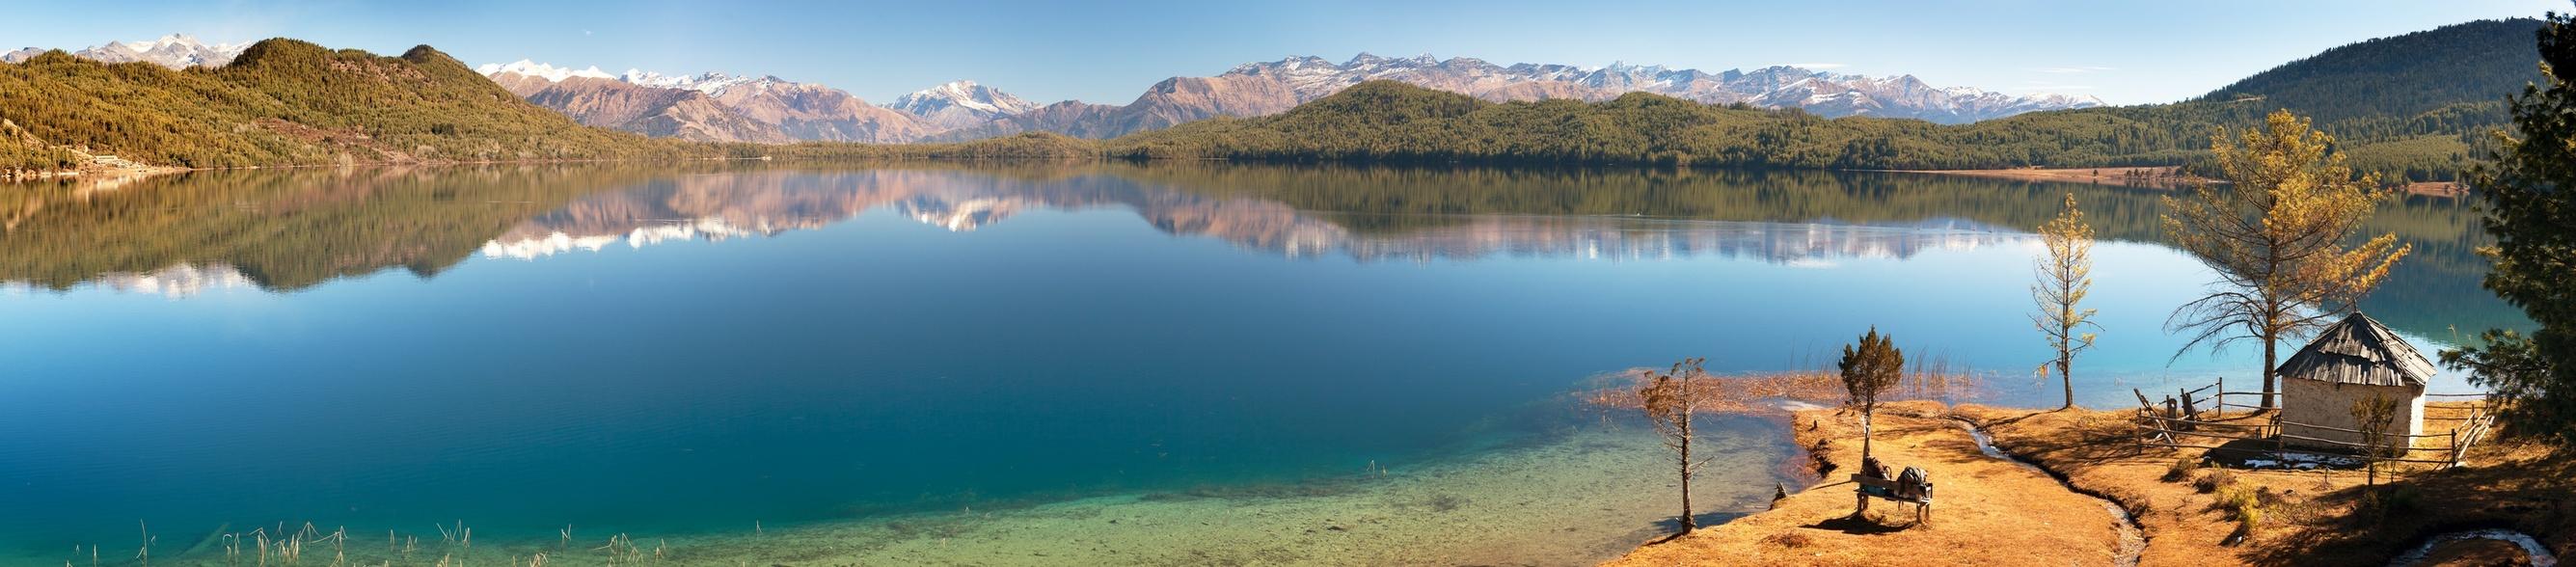 Rara-See - Ihr Trekkingziel